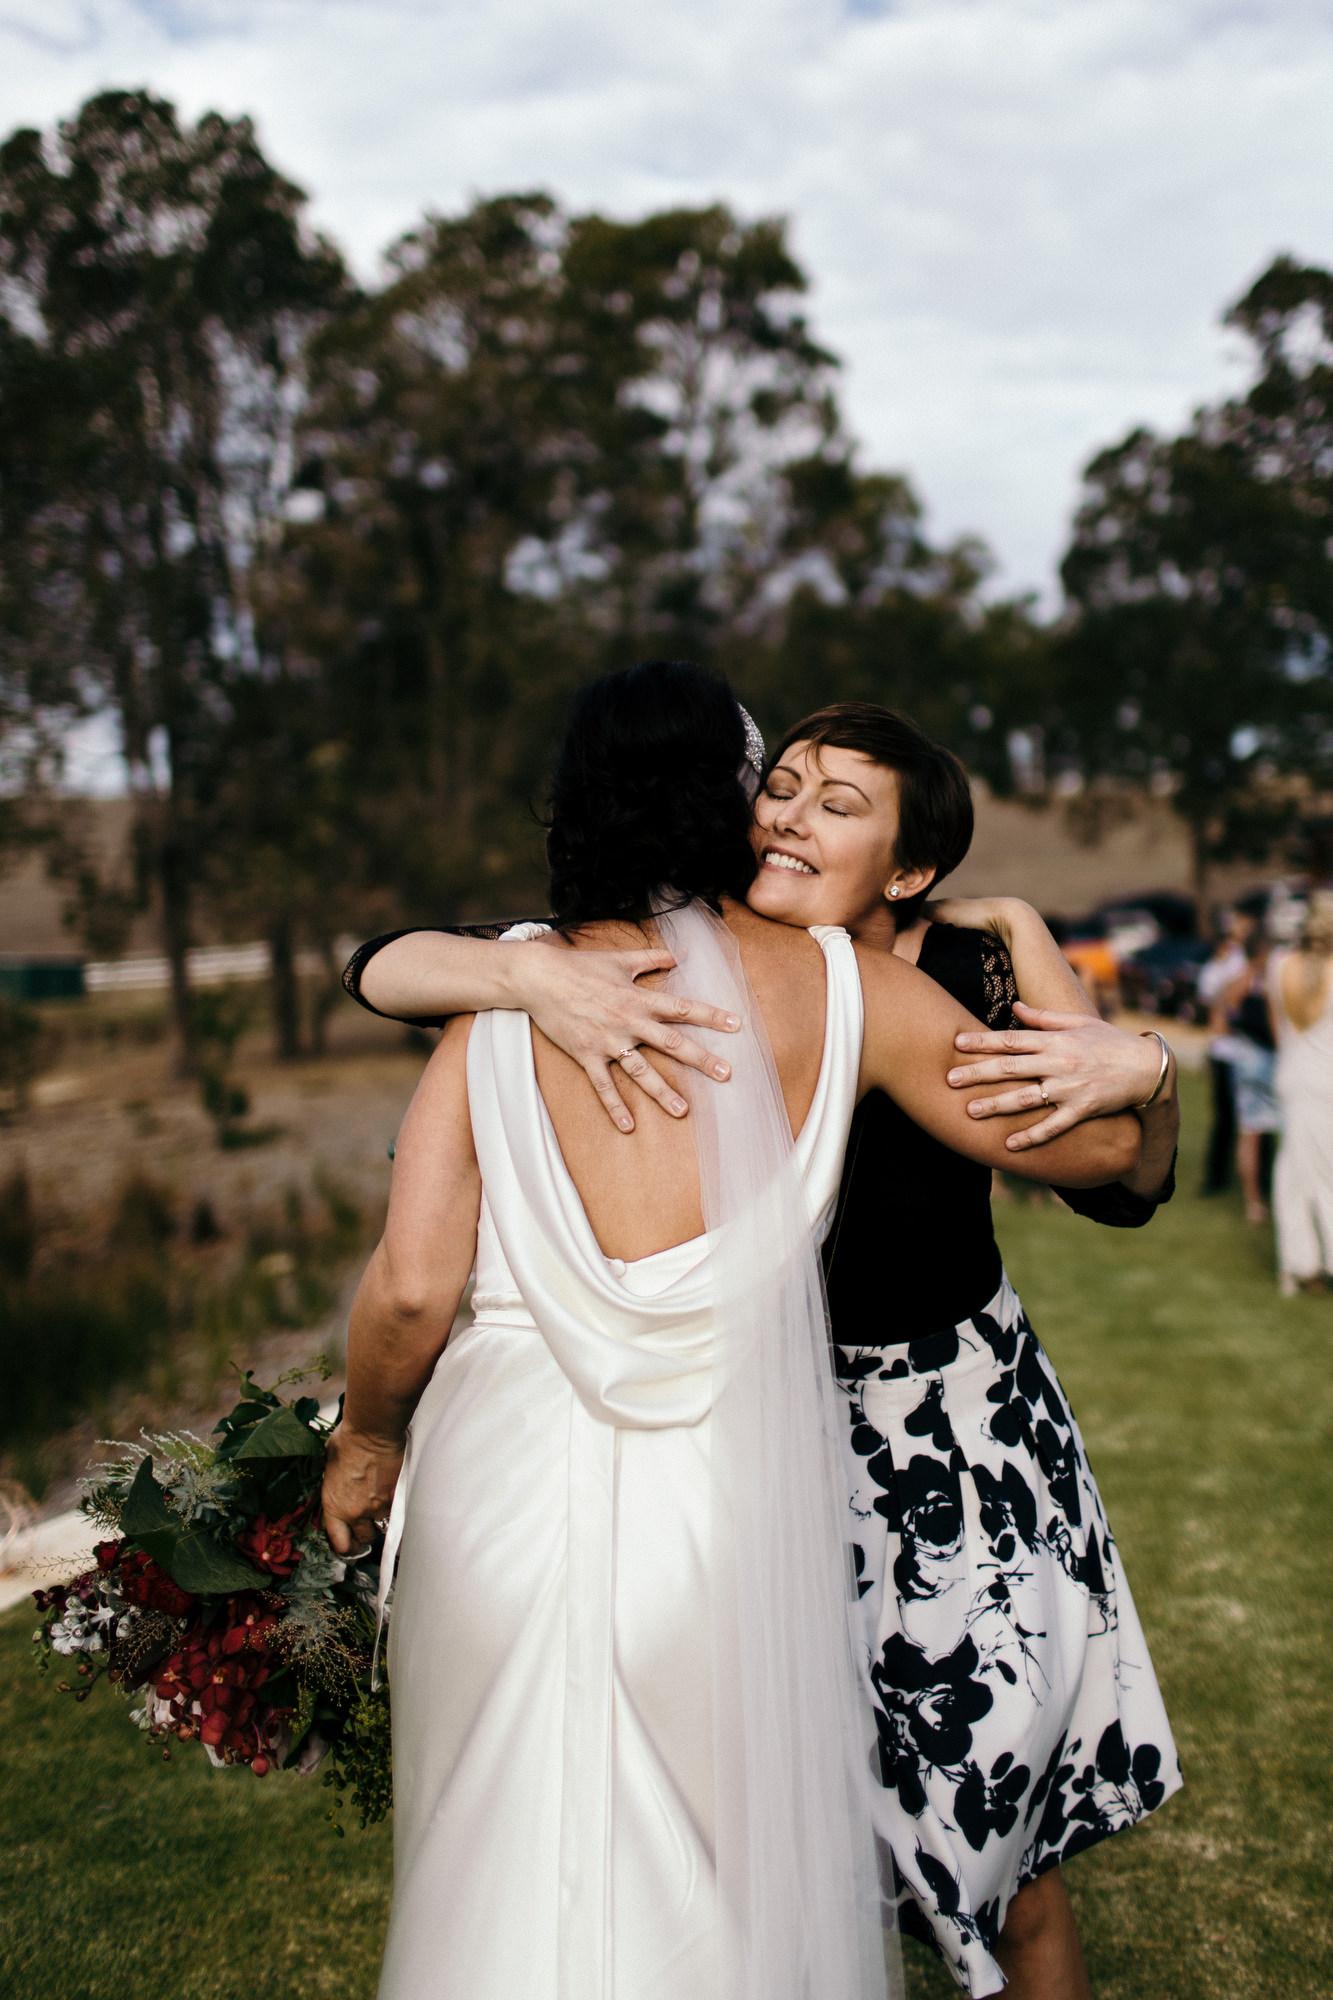 CLARK-WEDDING-EDITH-VALLEY-CARTER-ROSE-PHOTOGRAPHY-344.JPG